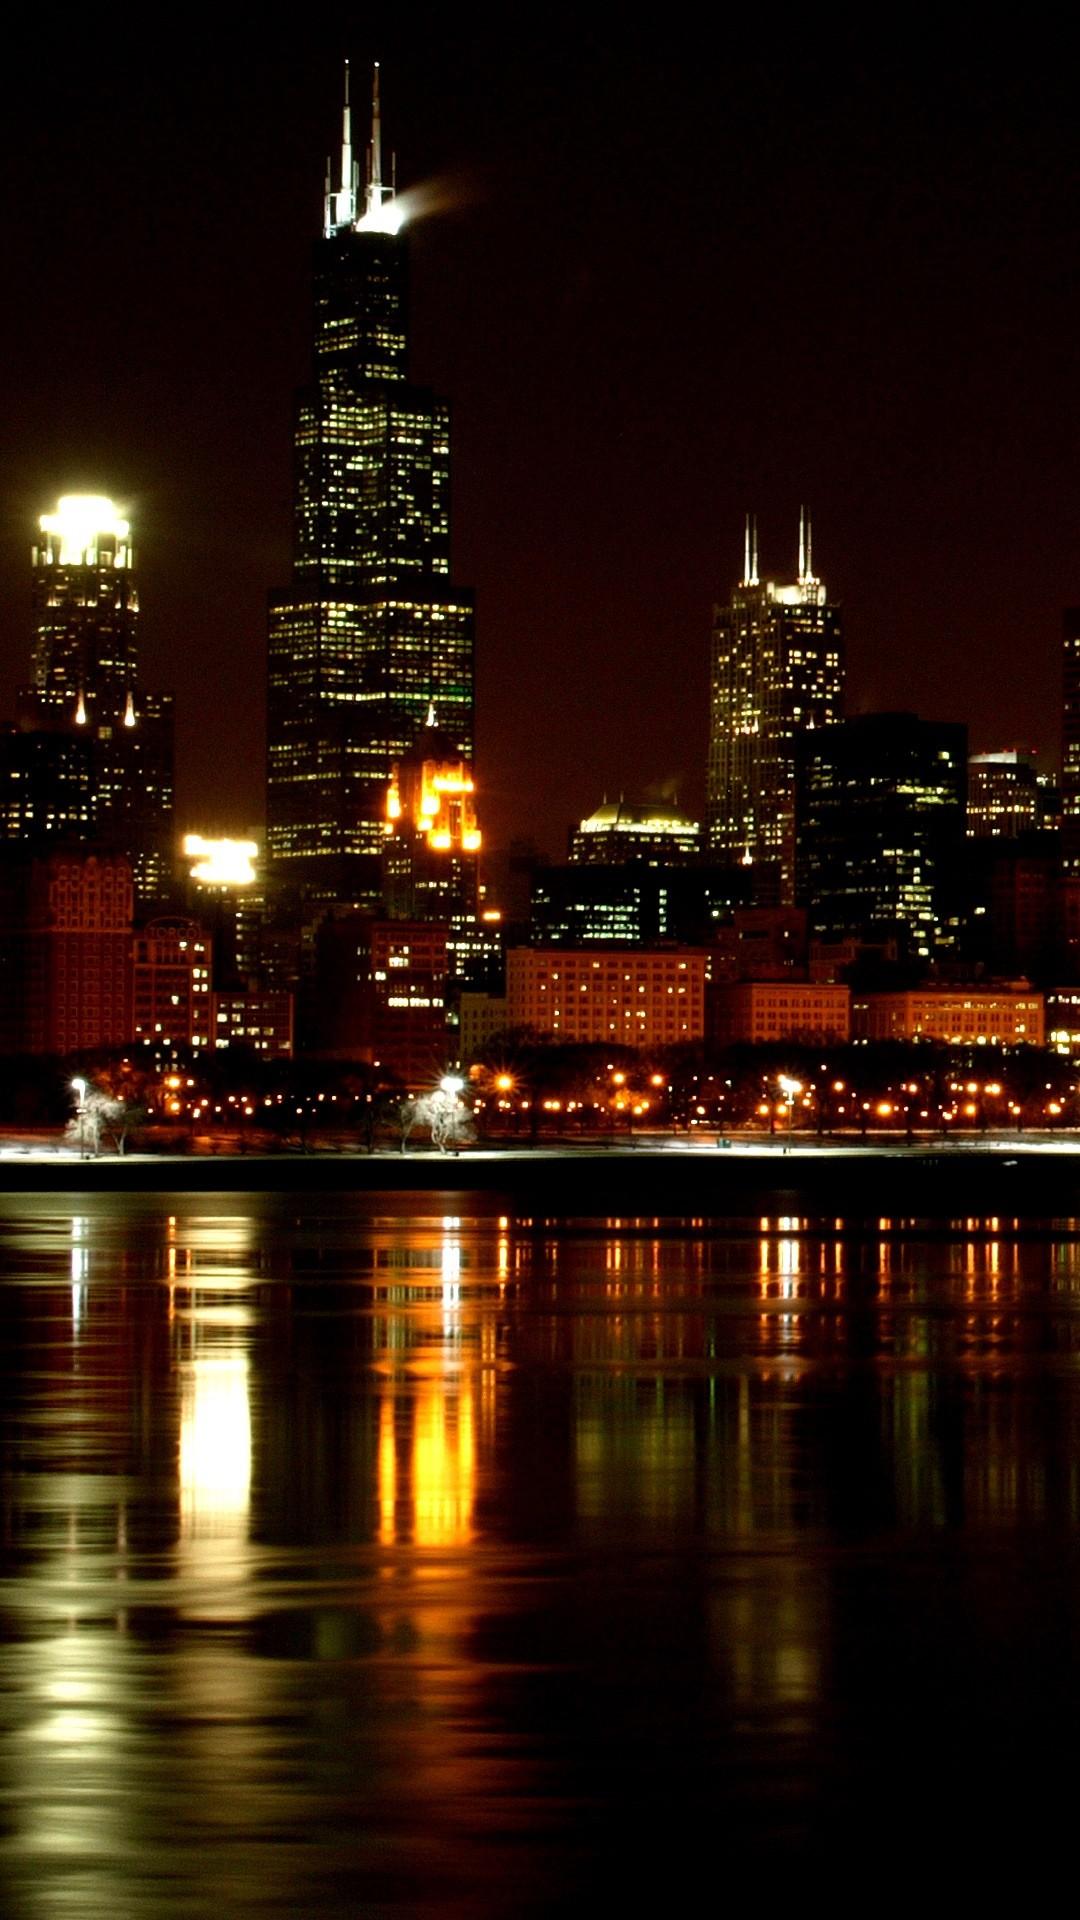 New York Iphone X Wallpaper High Resolution Chicago Skyline Wallpaper 64 Images